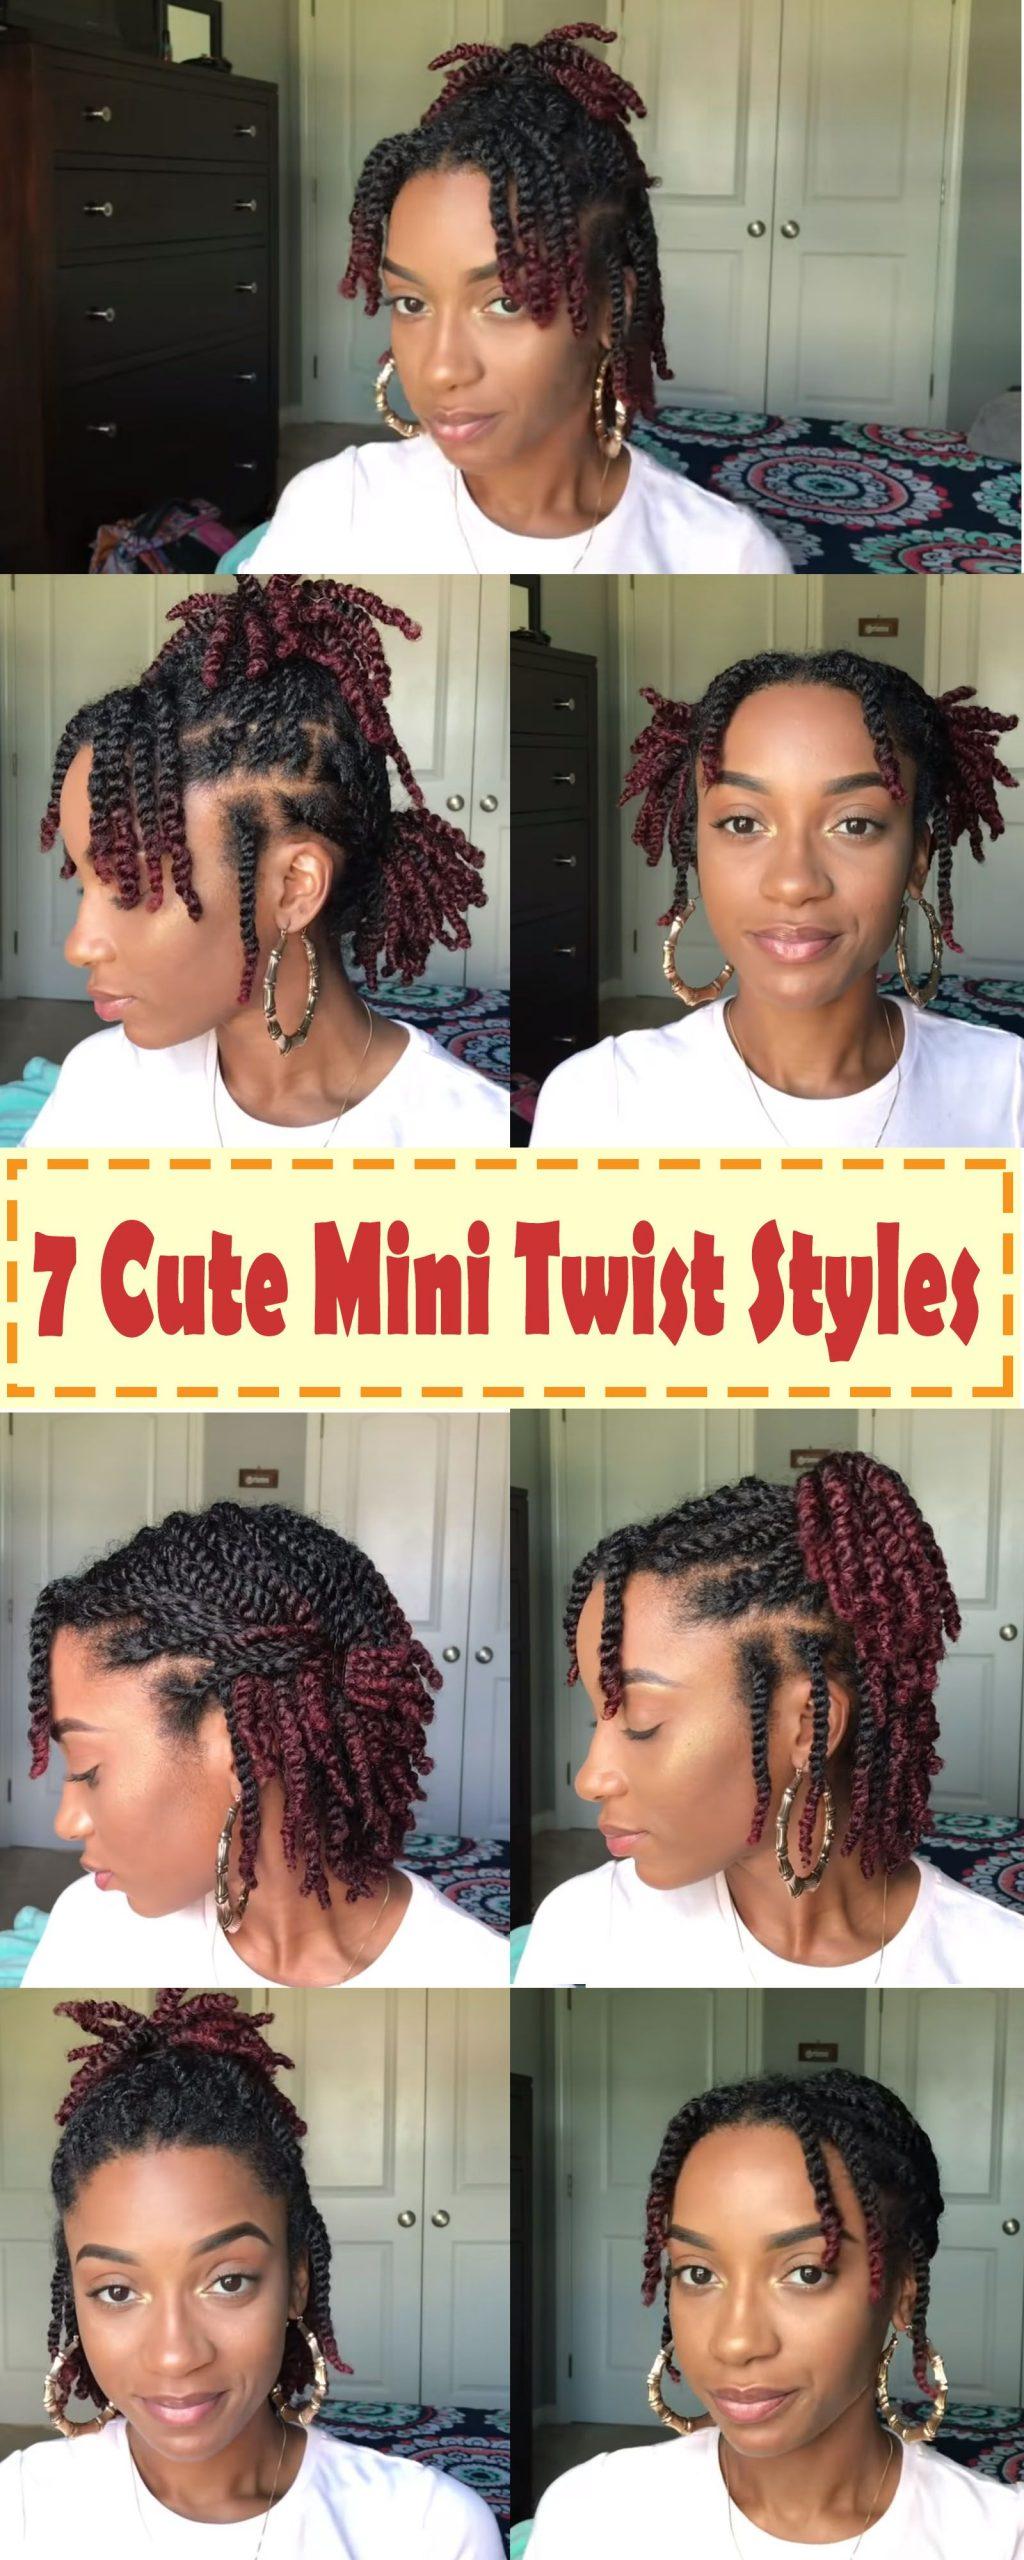 Natural black hairstyles for women hairstyleforblackwomen.net 2 scaled